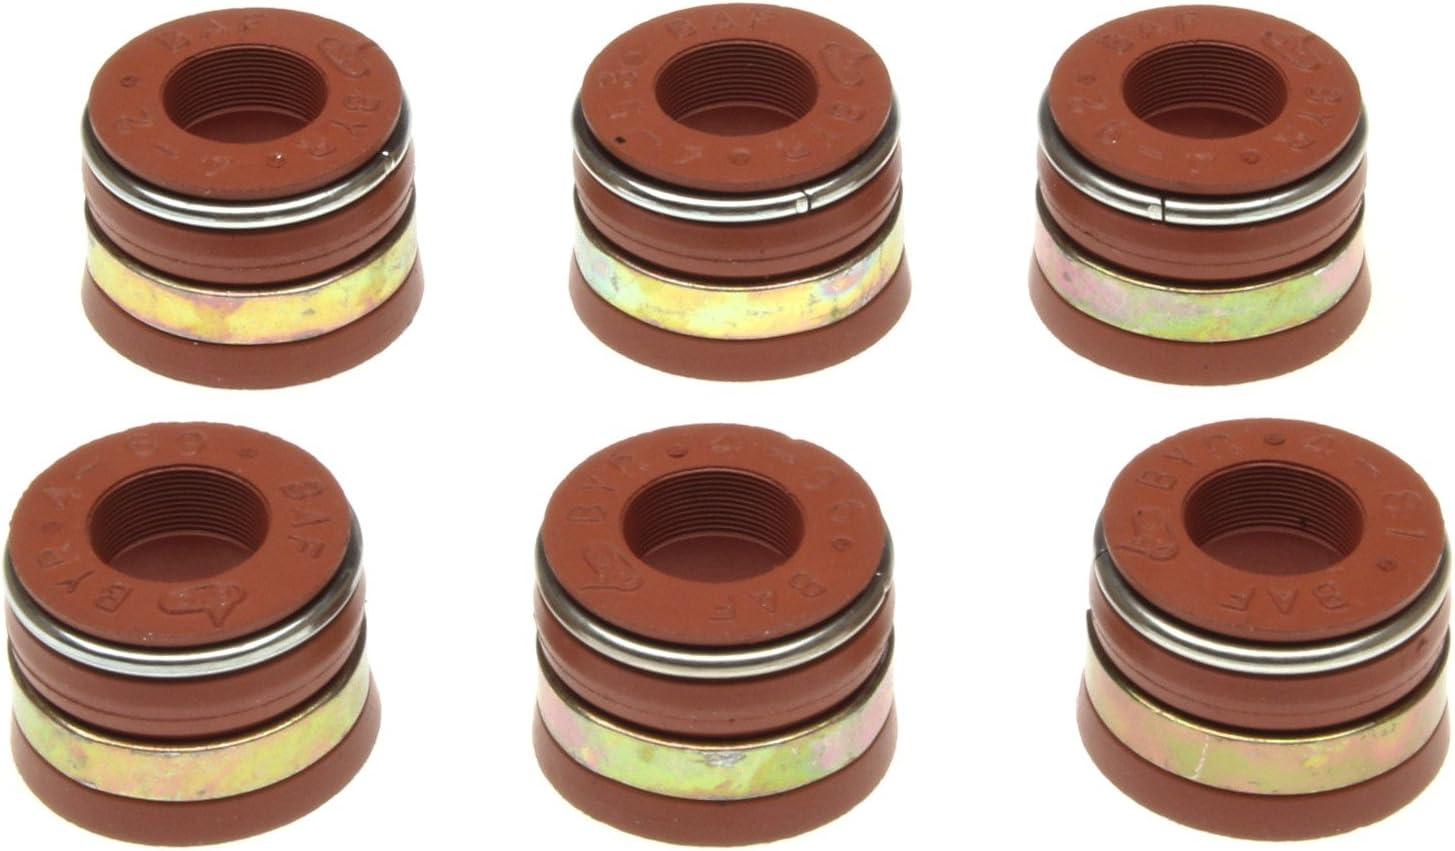 MAHLE SS45484 Las Vegas Mall Engine Valve Seal Stem Recommendation Set Oil